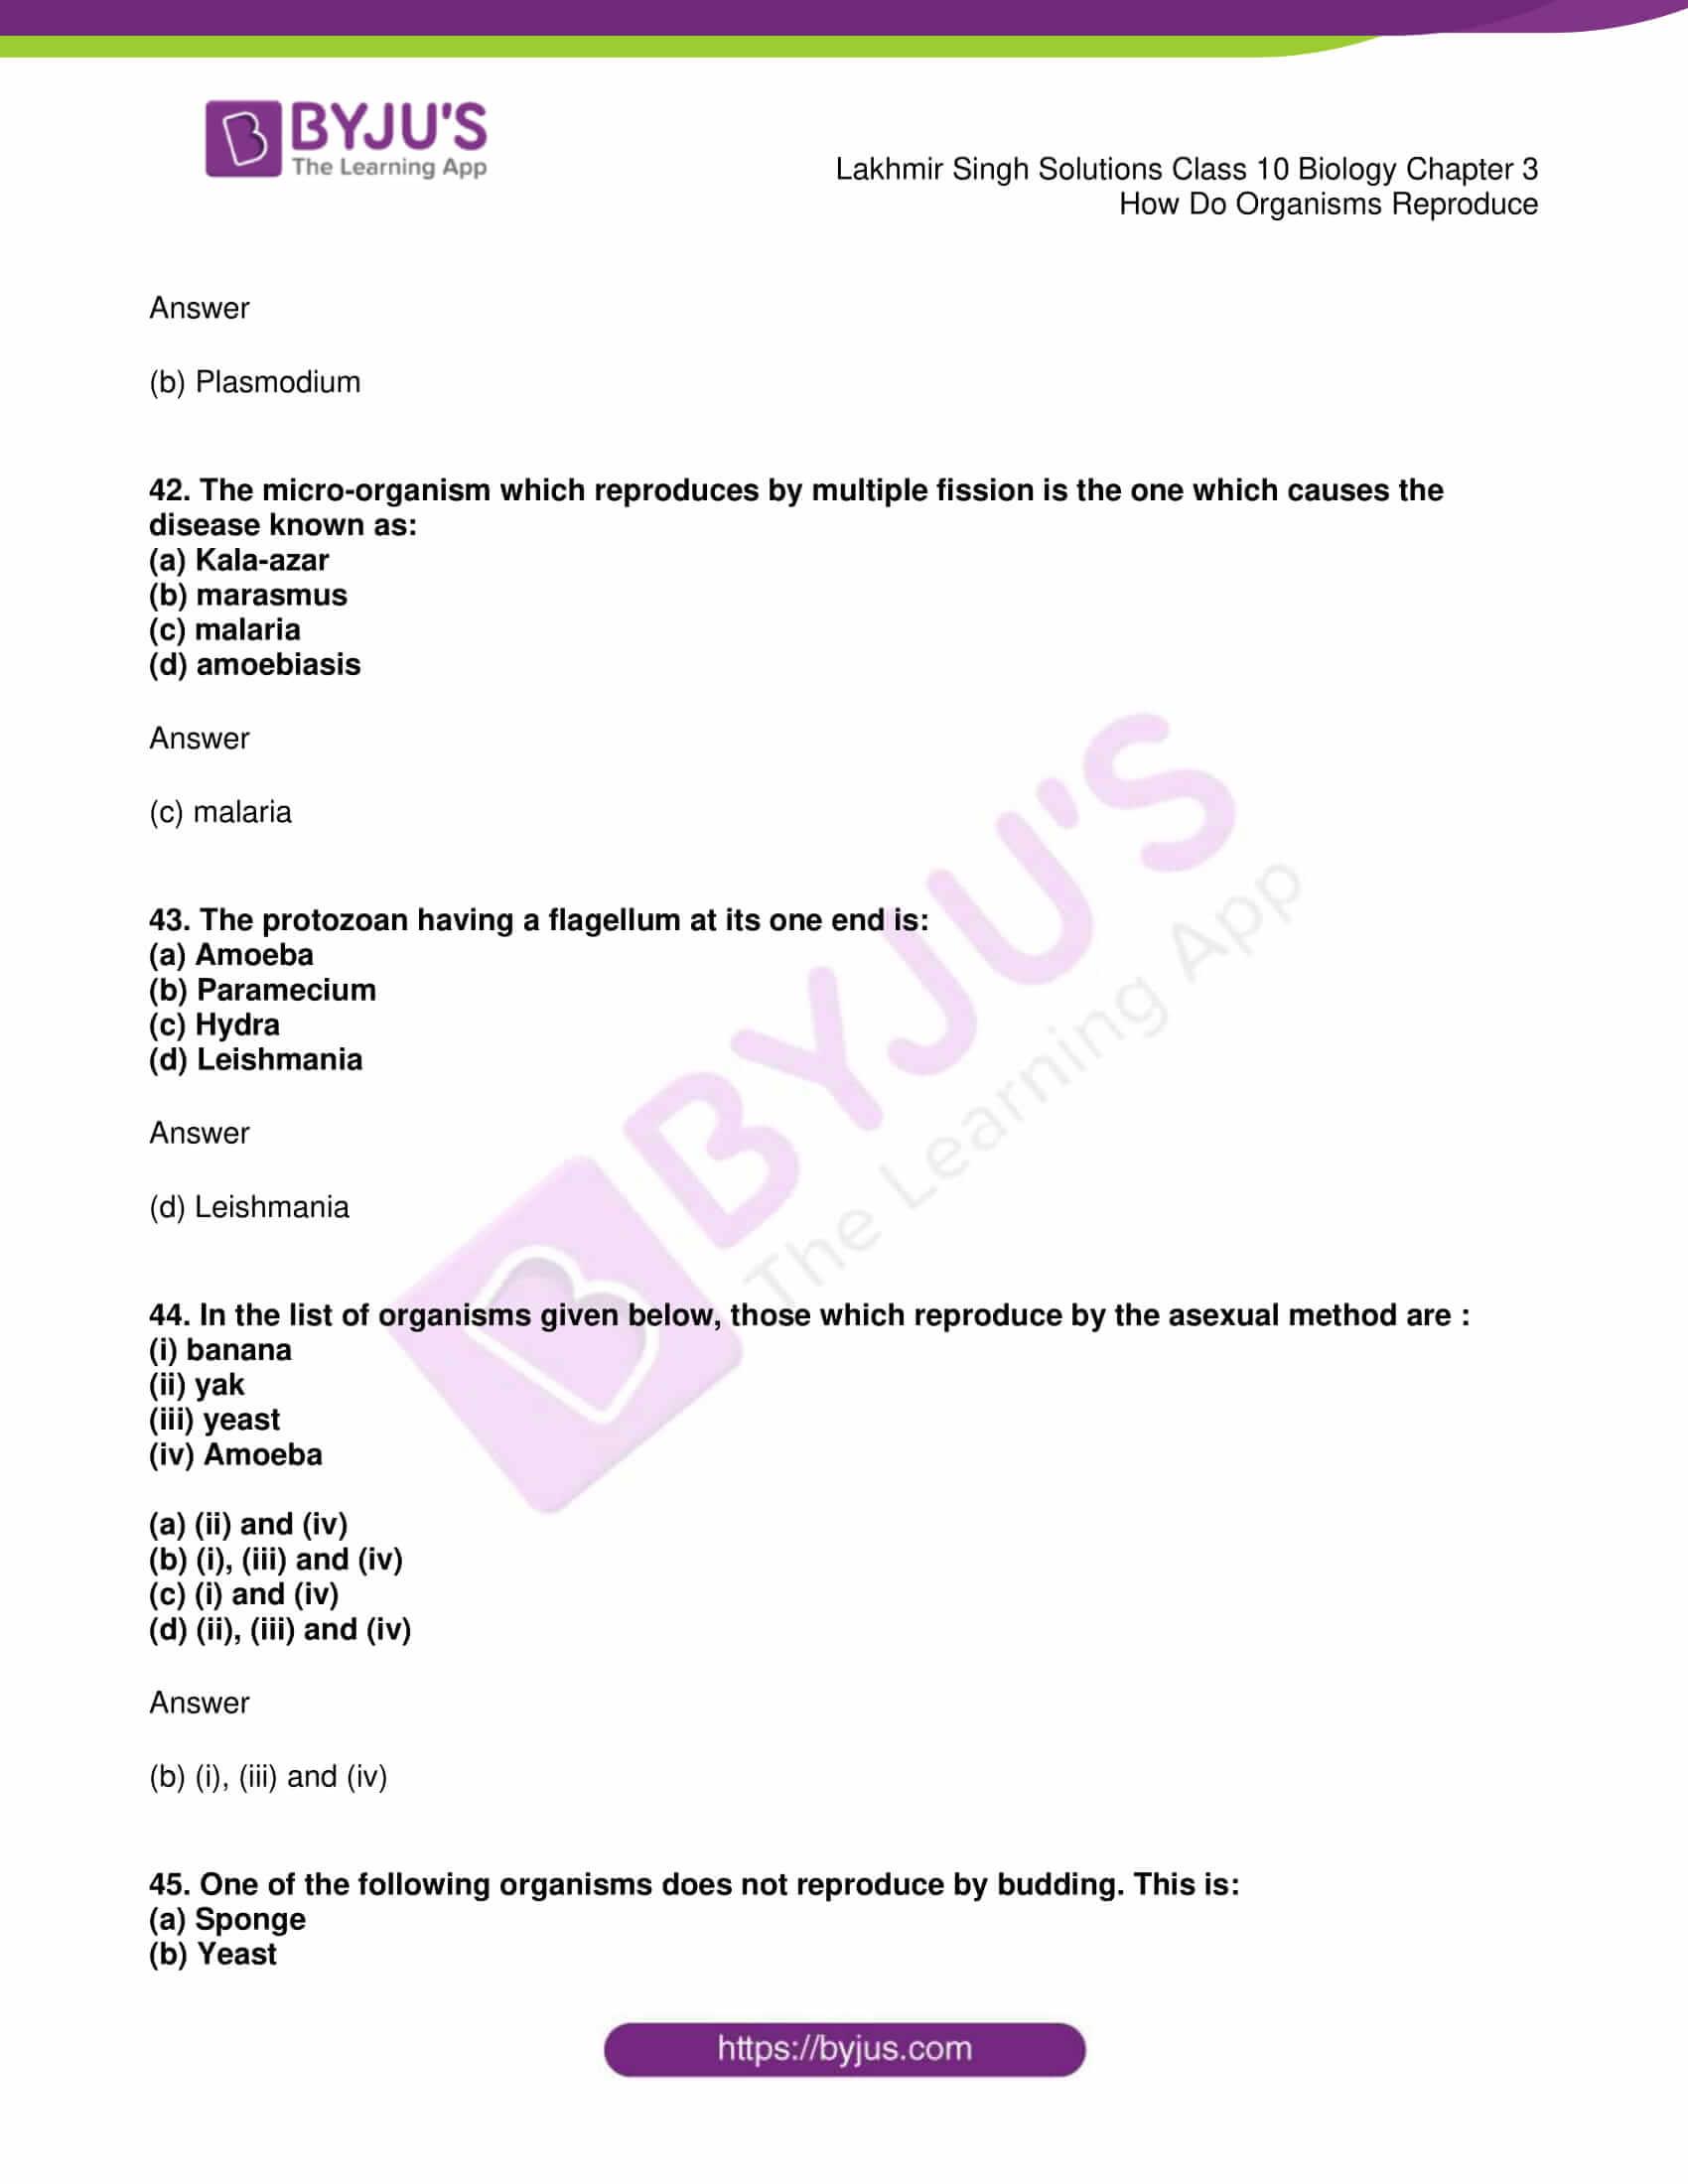 lakhmir singh solutions class 10 biology chapter 3 17